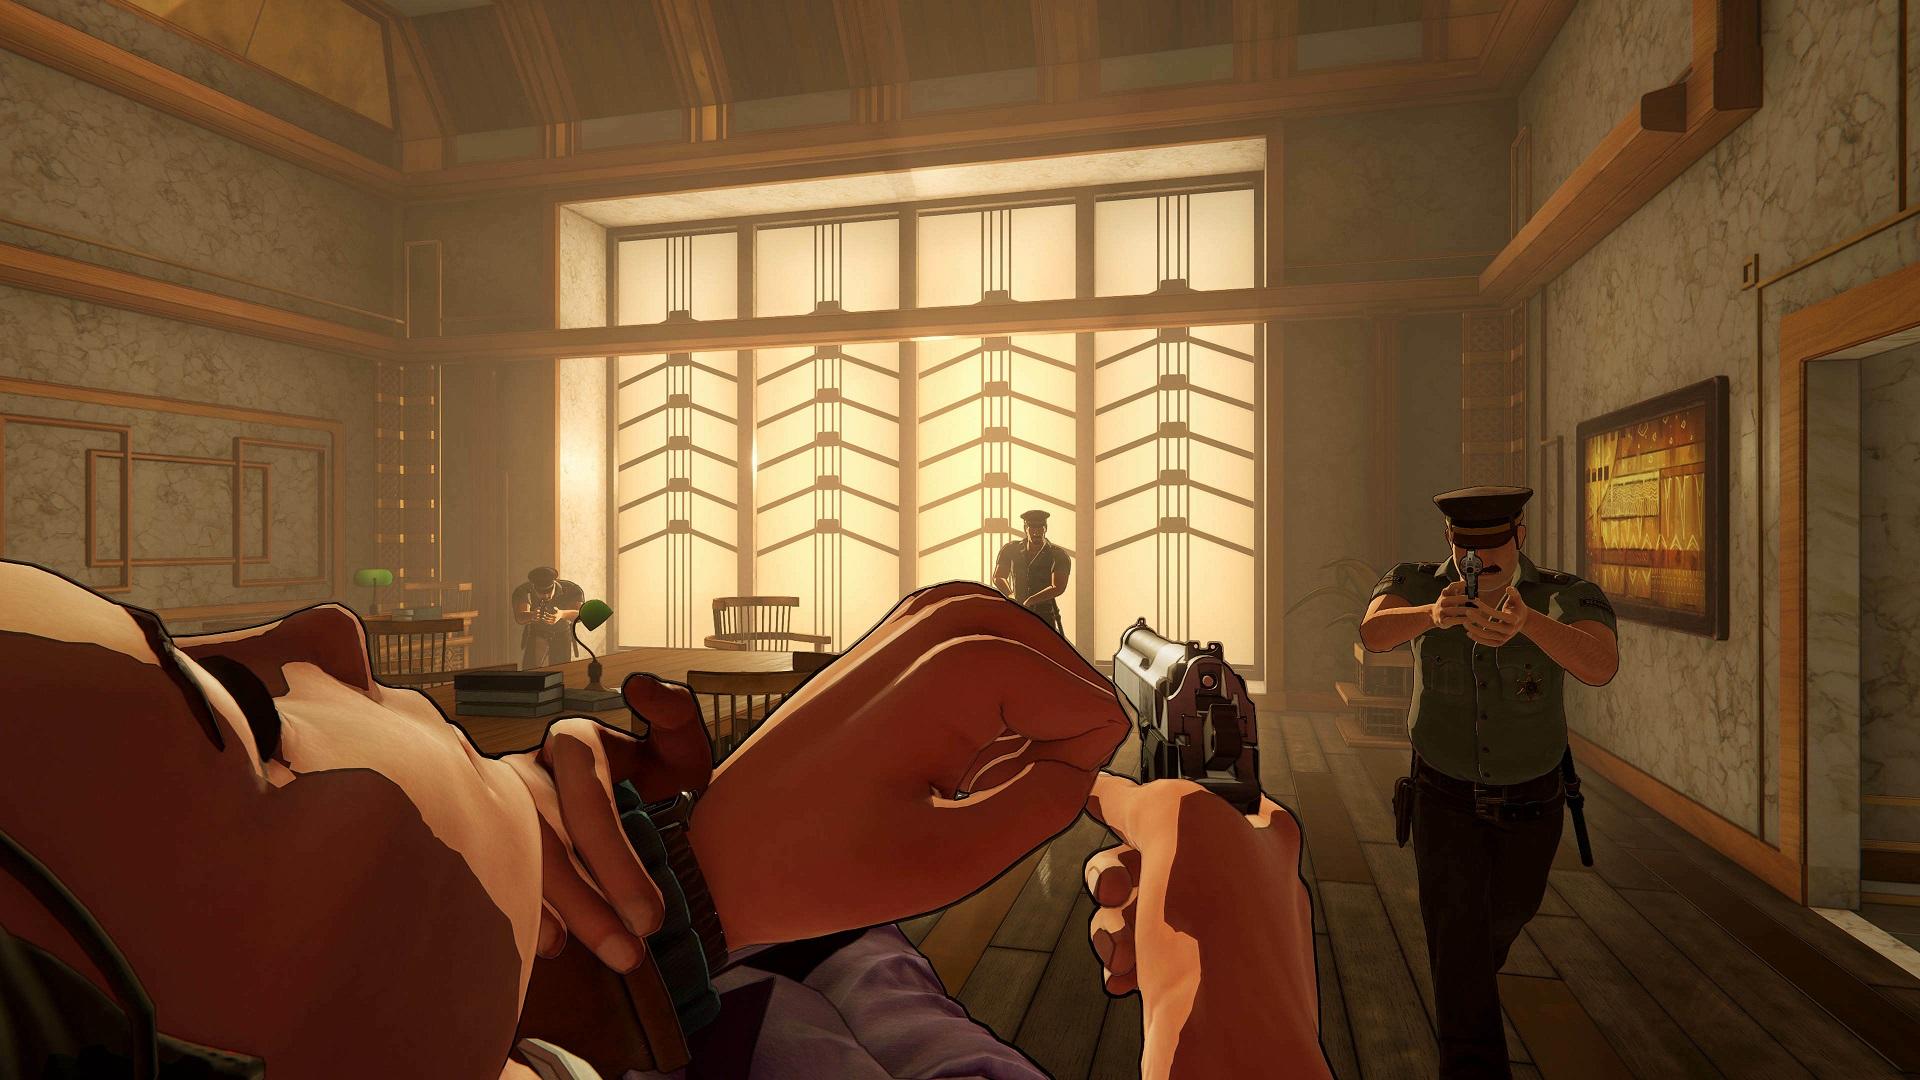 xiii-remake-pc-screenshot-01